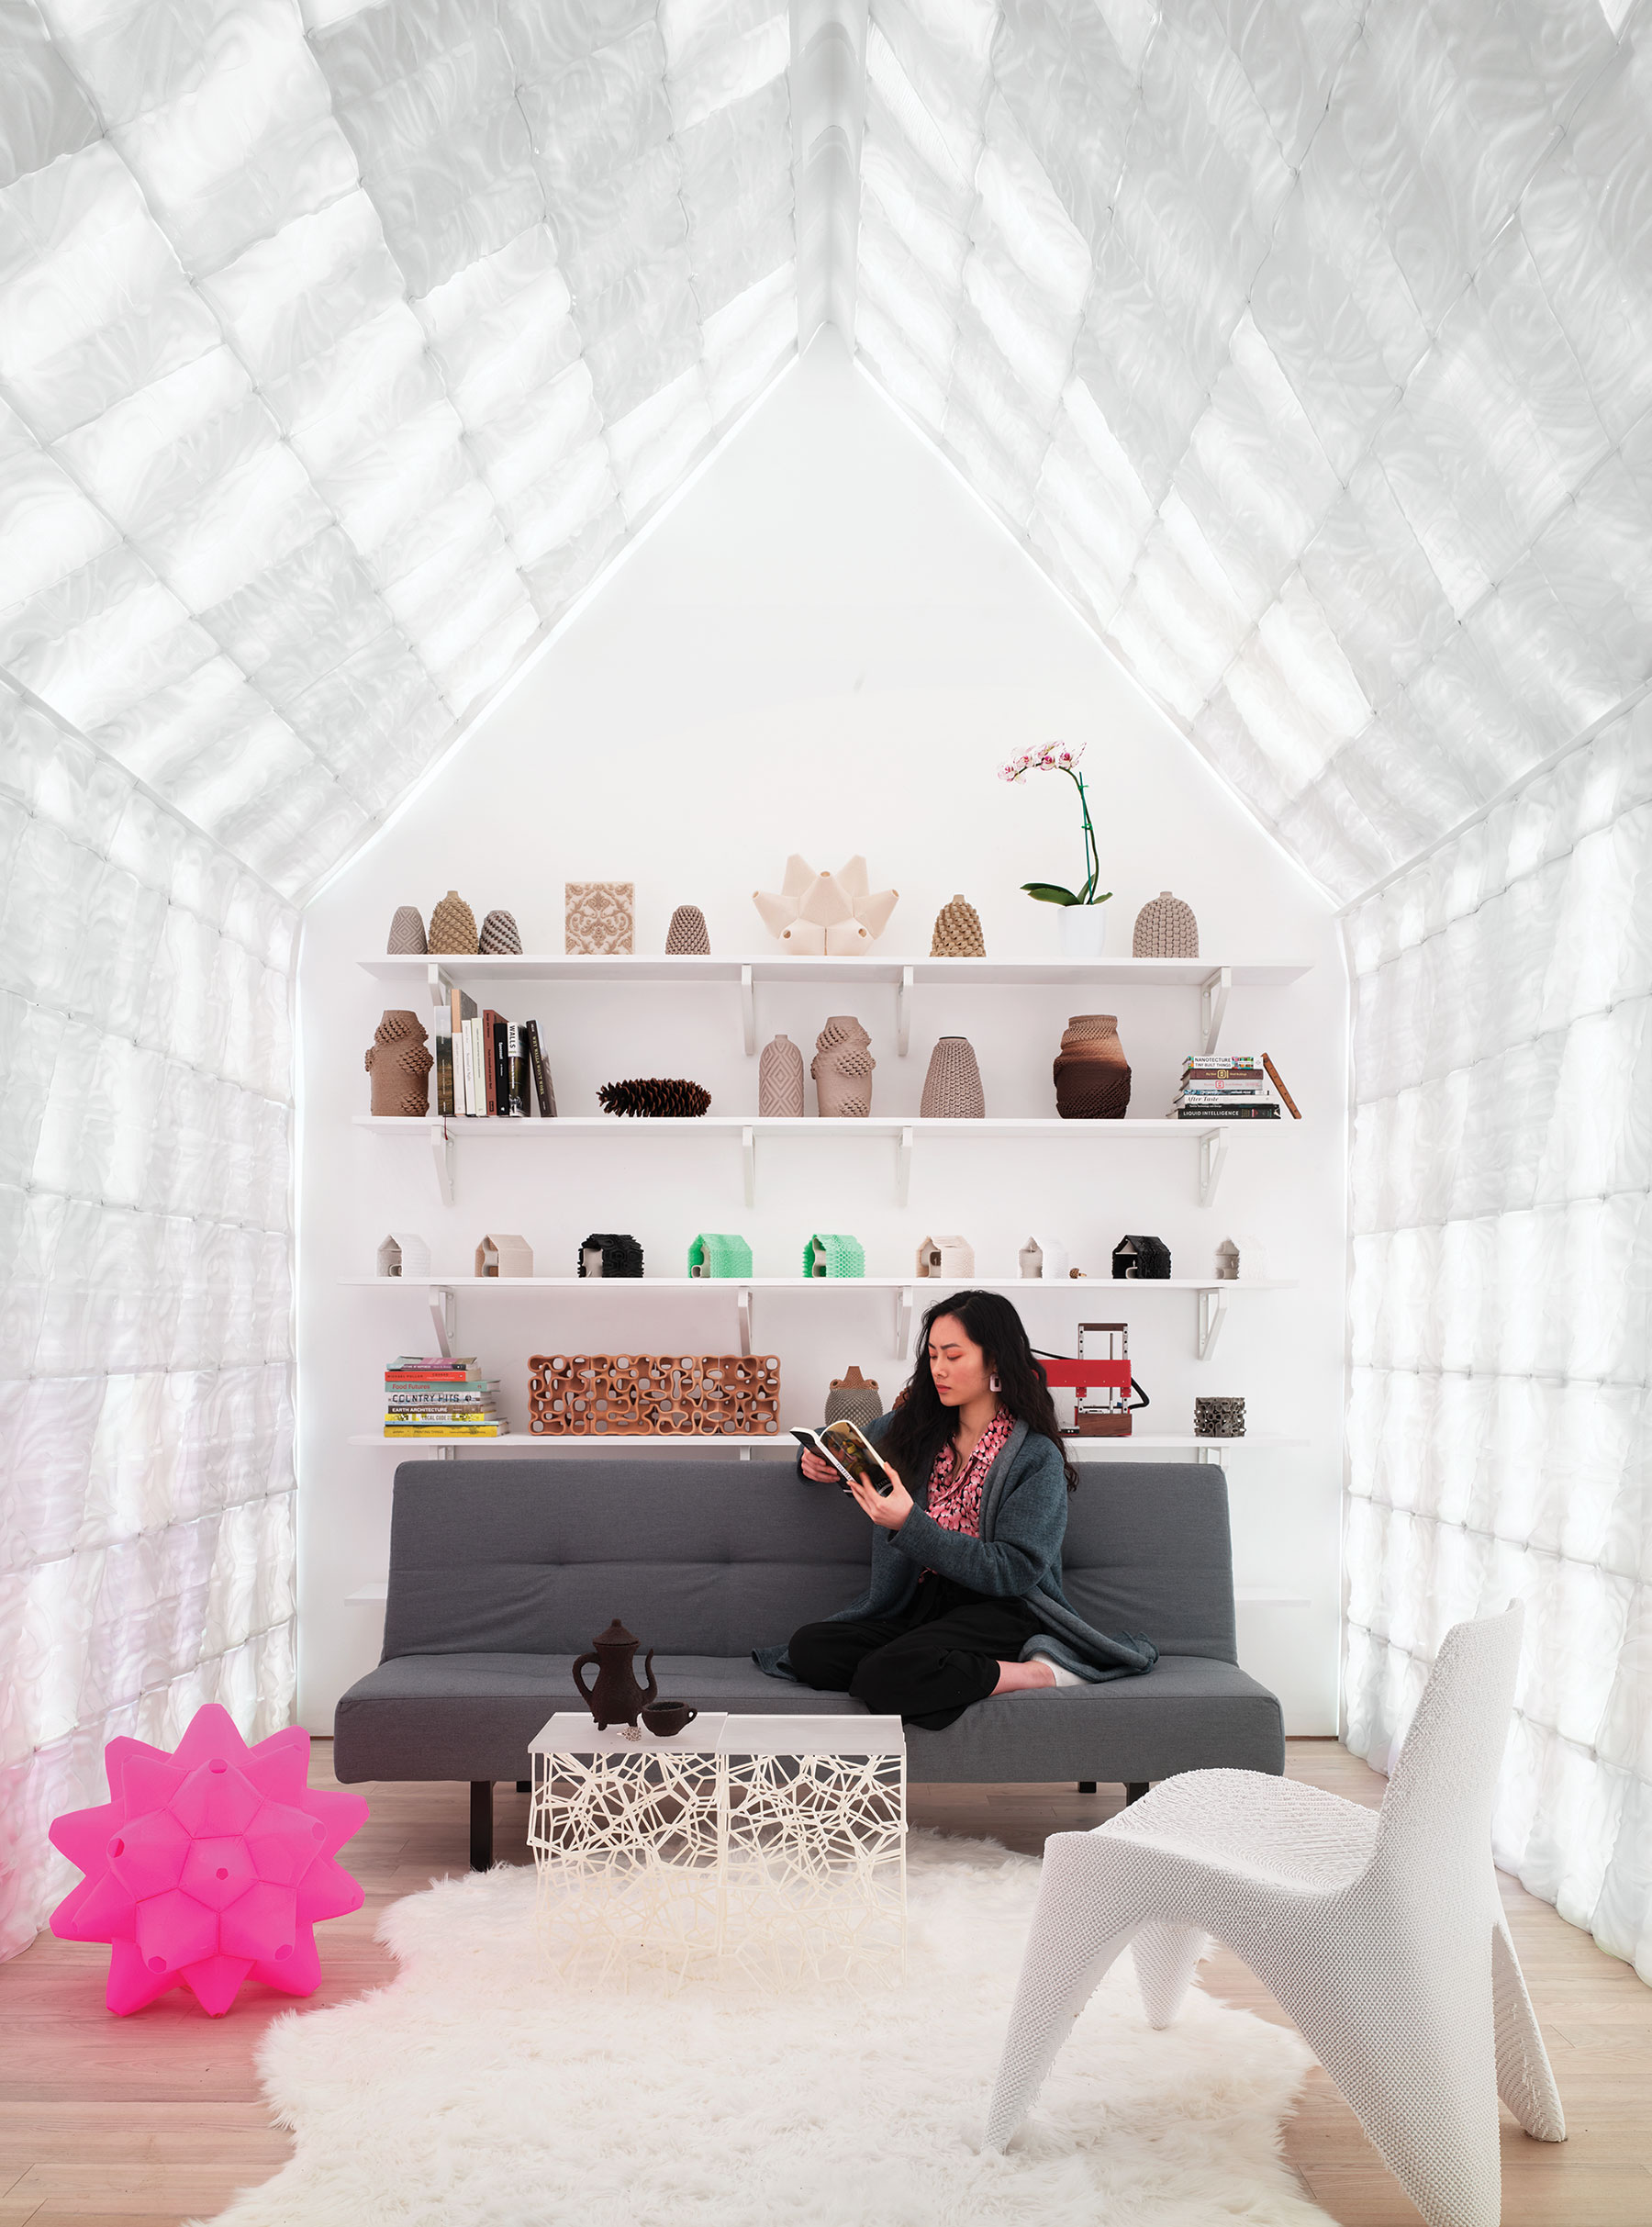 Ronald Rael, Cabin of 3D-Printed Curiosities (interior), 2018. Photo by Matthew Millman.